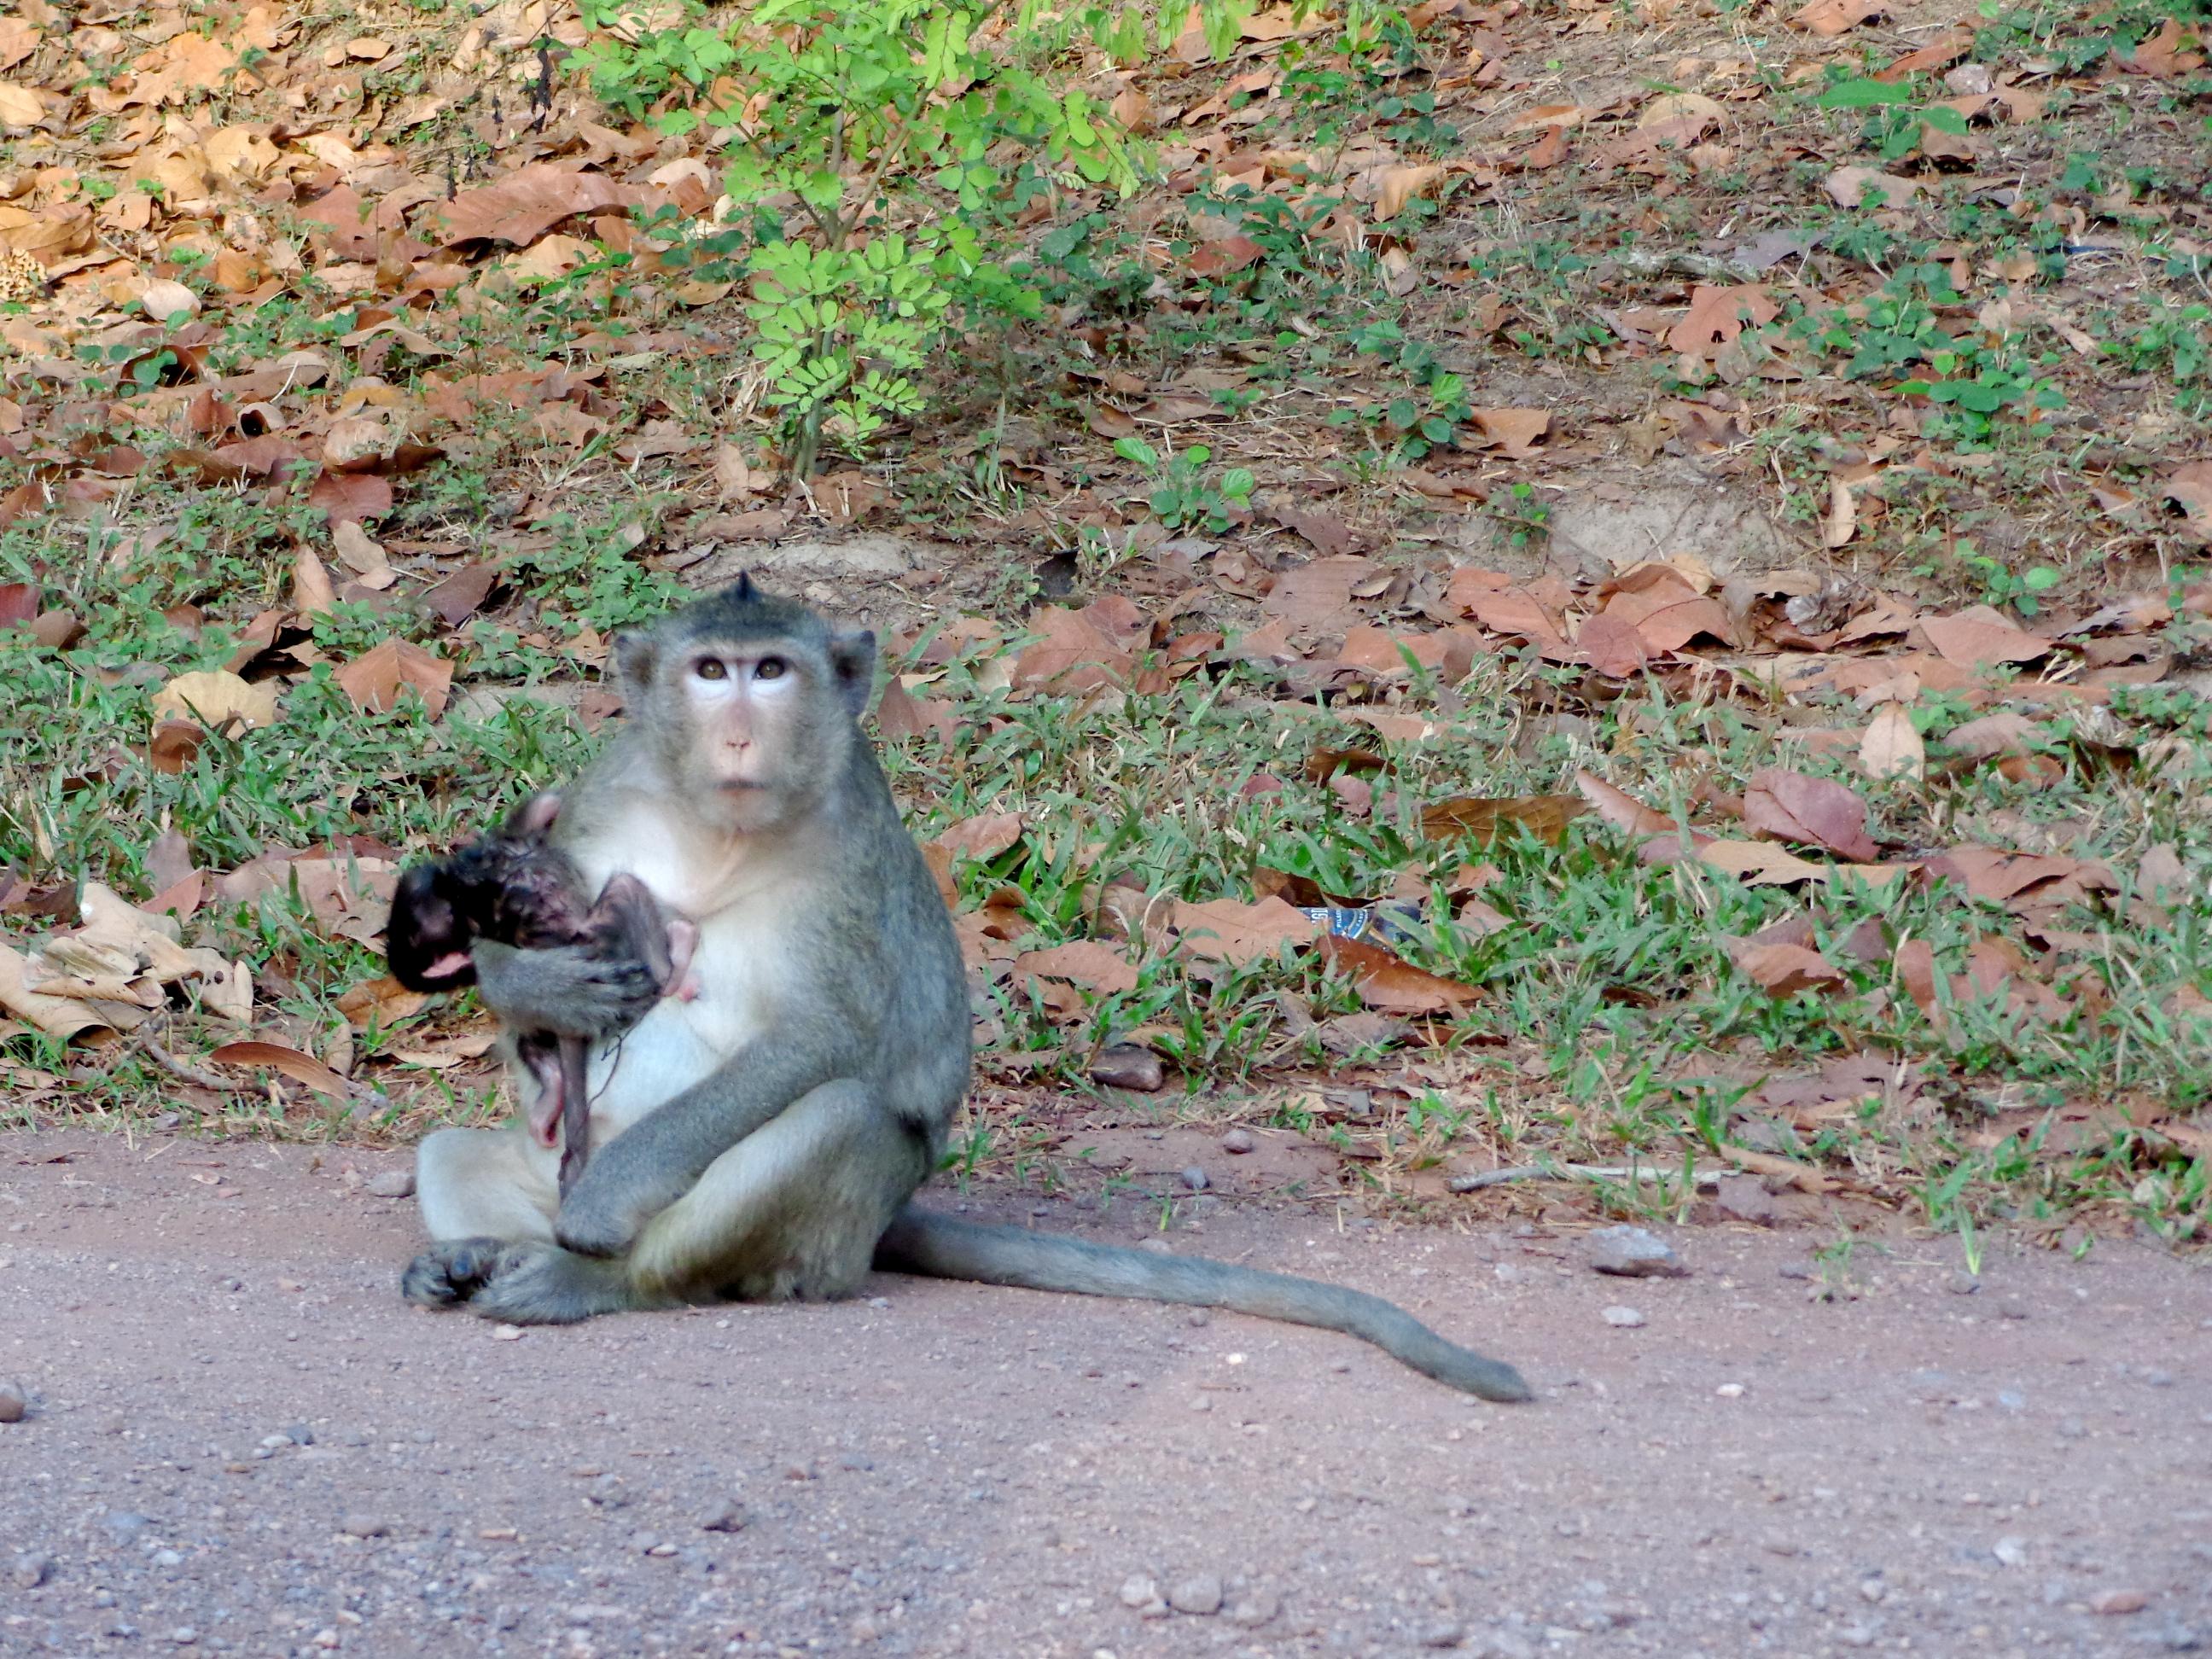 Newborn monkey in Cambodia